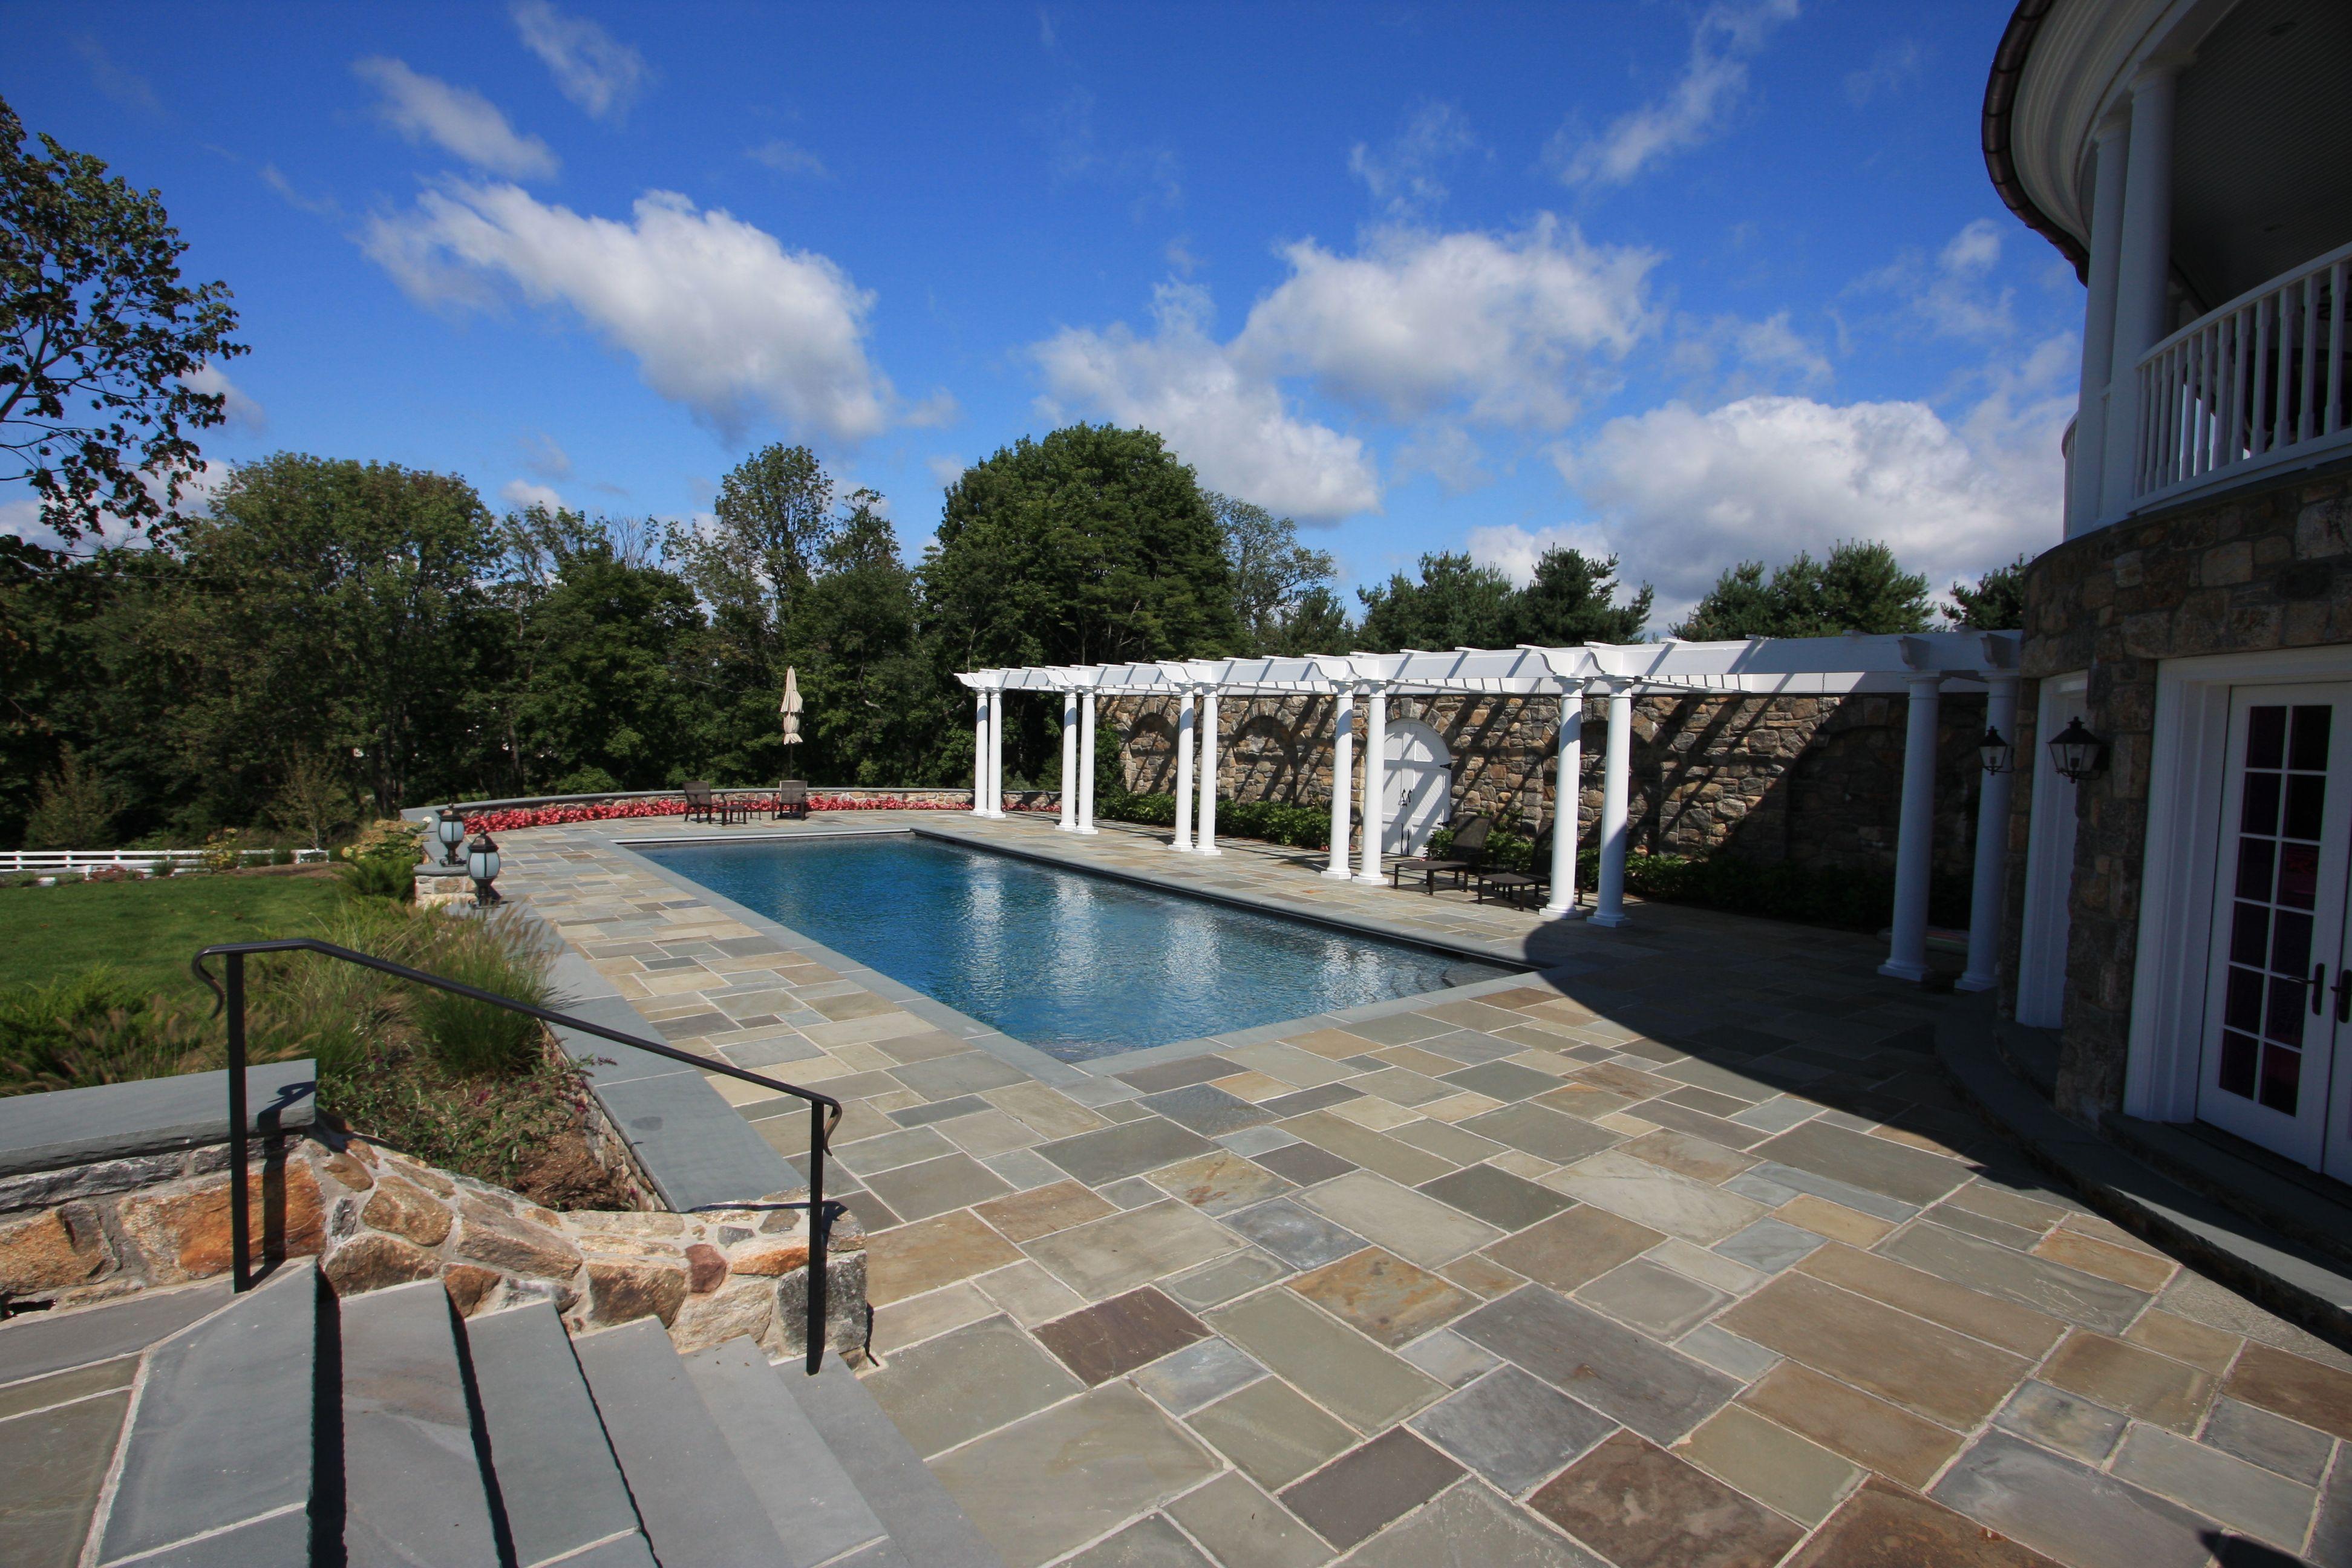 Pool Patio And Pergola Design By Conte U0026 Conte, LLC Landscape  Architects/designers In